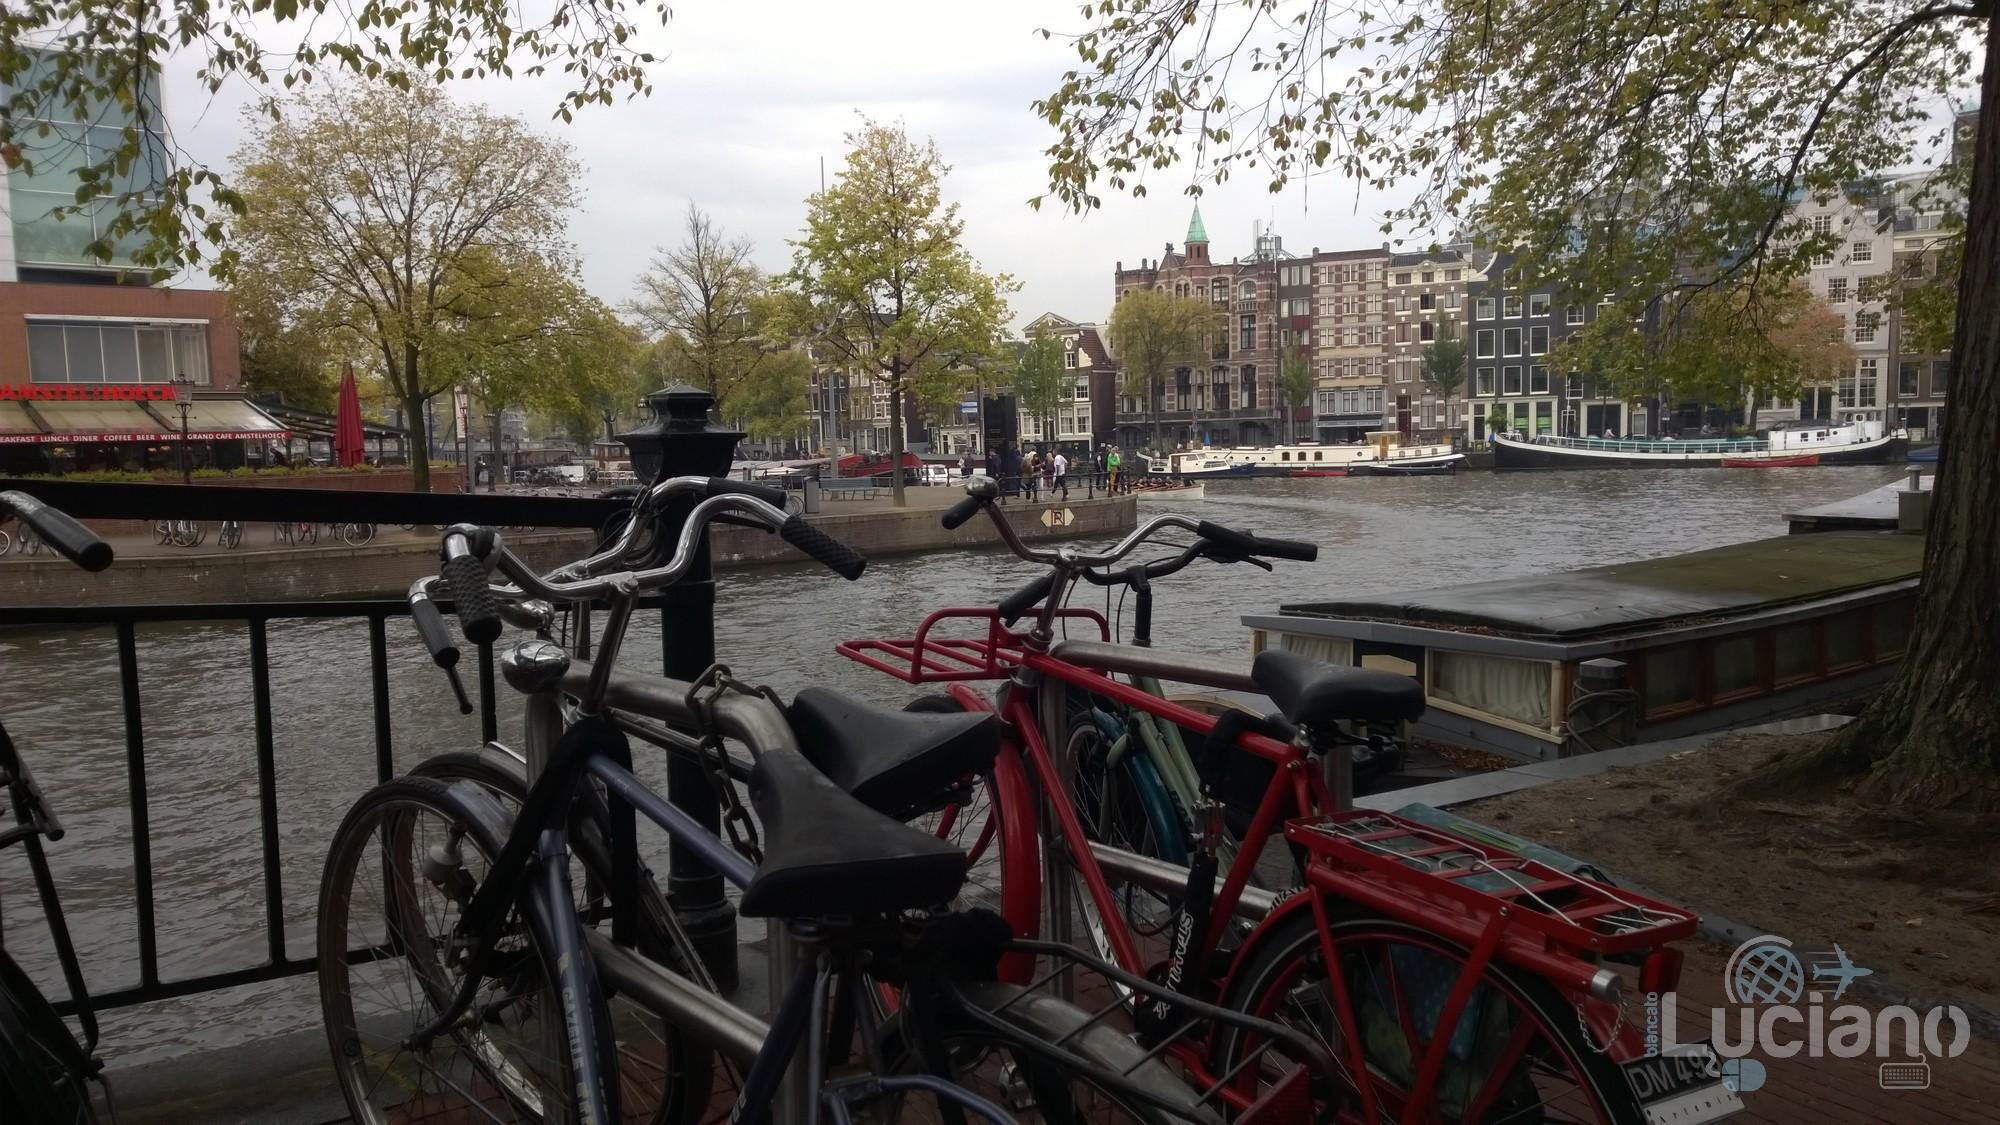 amsterdam-2014-vueling-lucianoblancatoit (177)